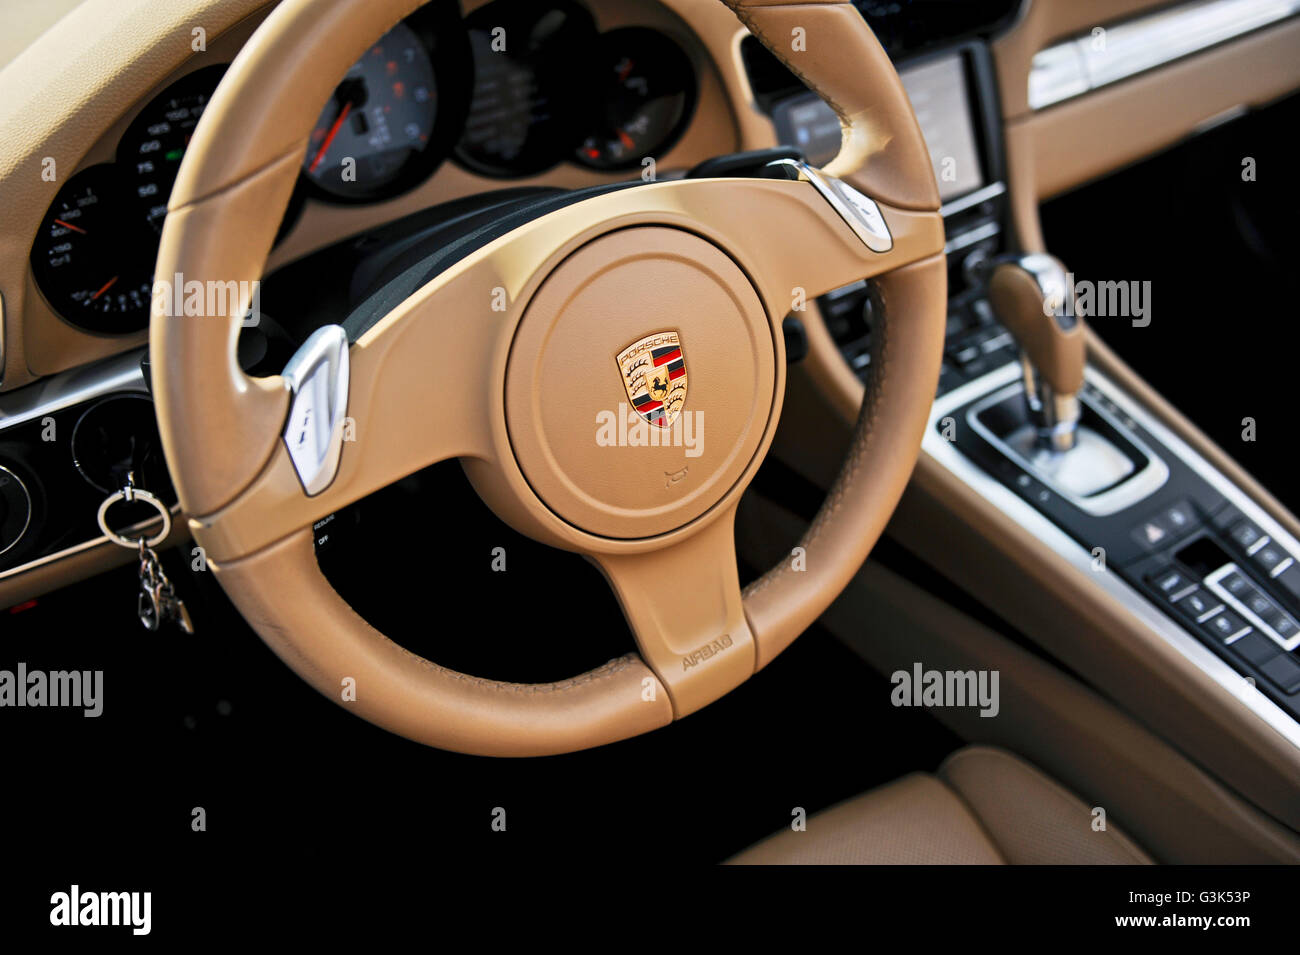 The interior dashboard, steering wheel and console of a Porsche 911 Carrera S - Stock Image